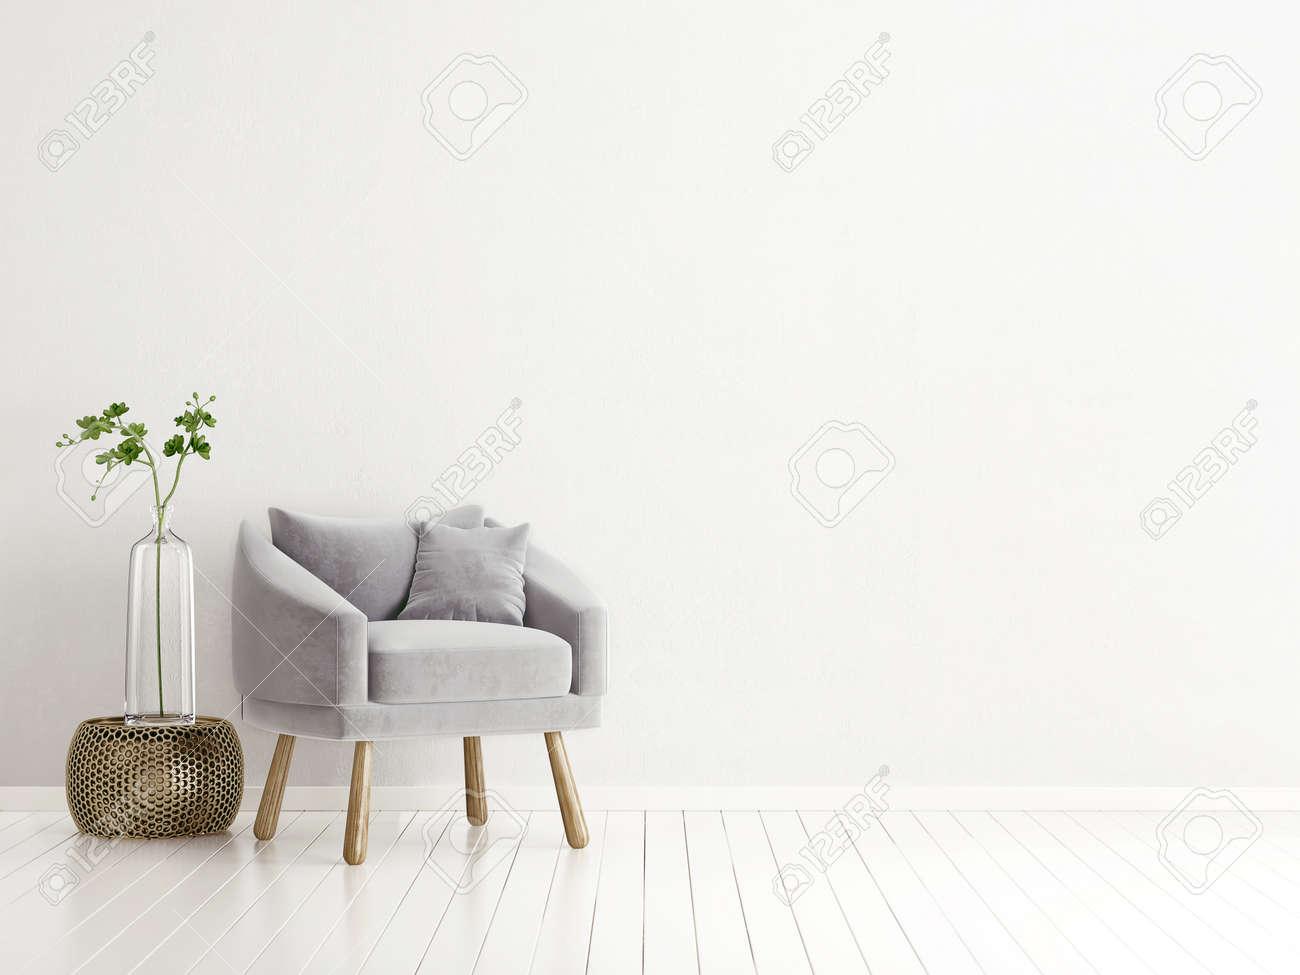 modern interior room with nice furniture. 3d illustration - 74520171